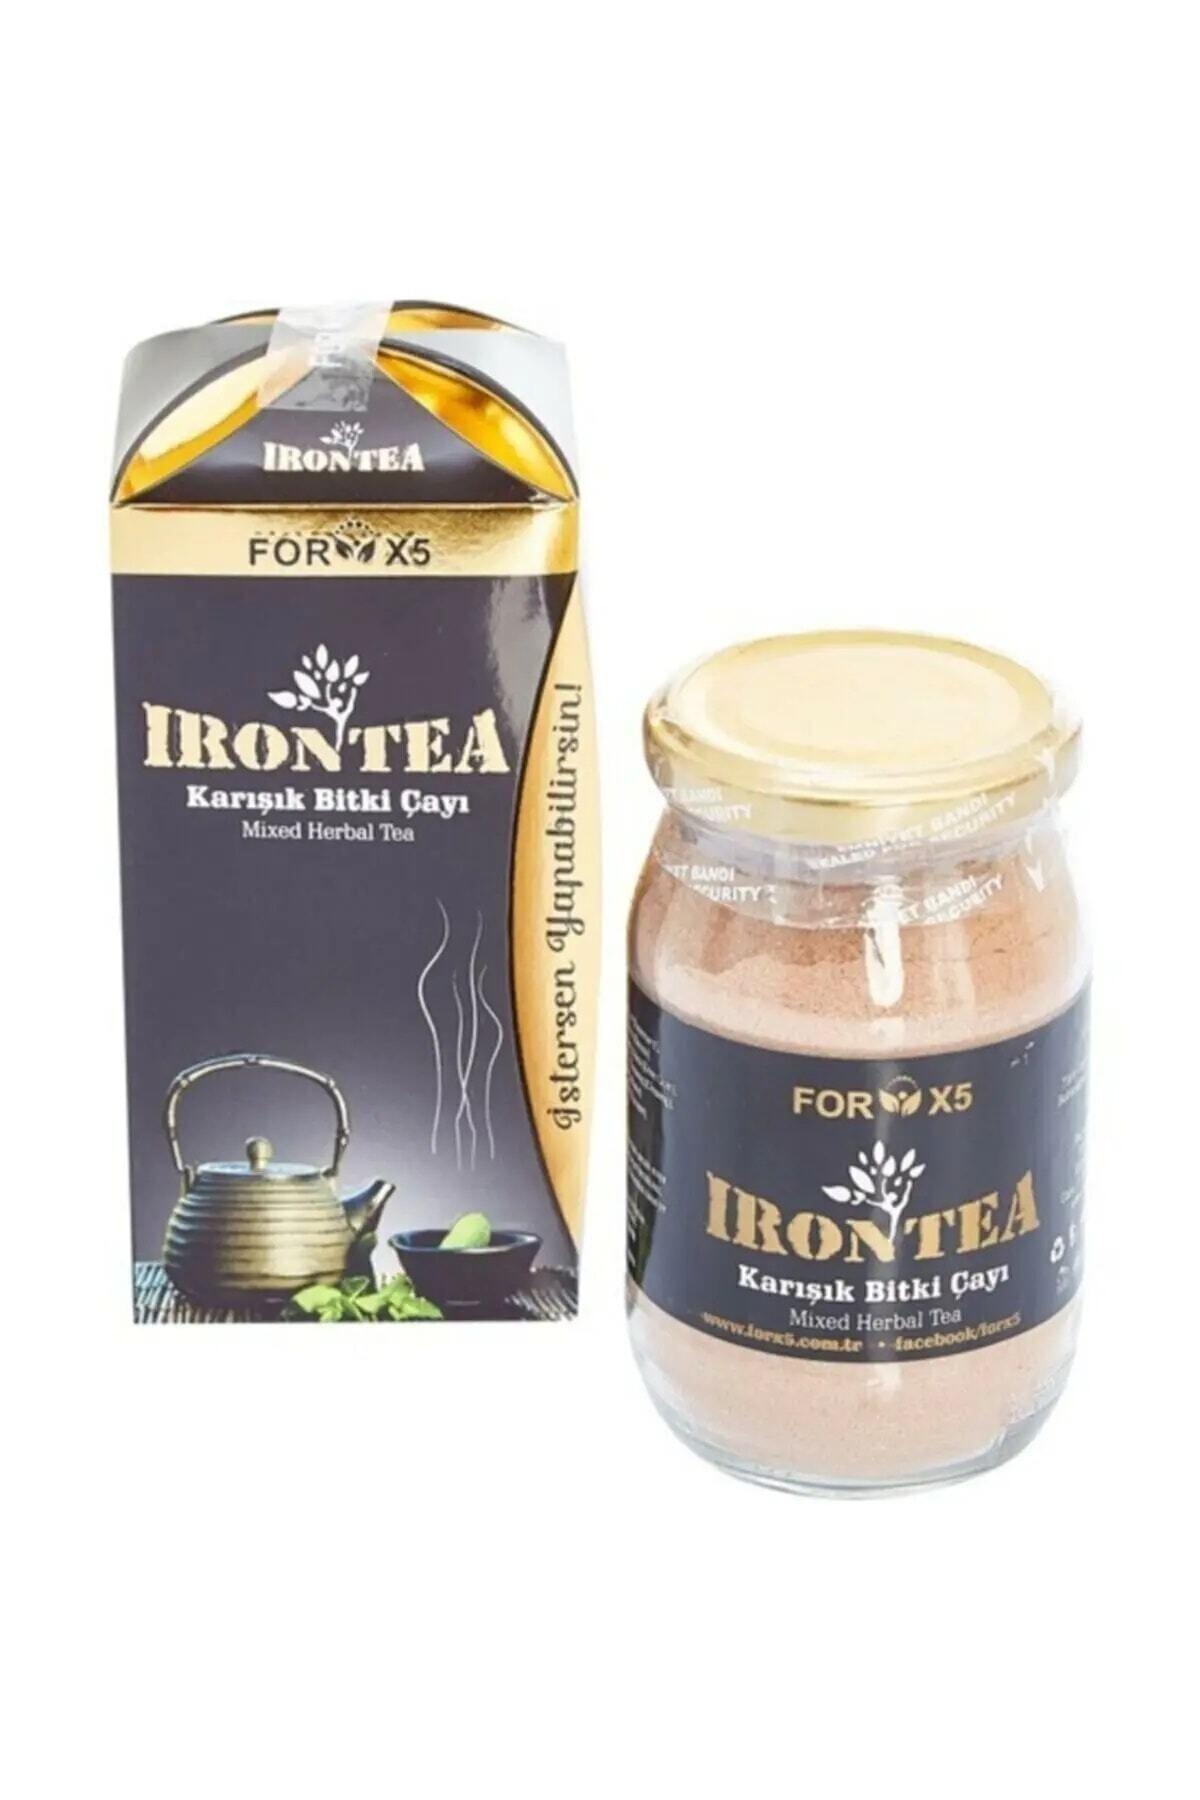 İroni For X5 Iron Tea Karışık Bitki Çayı 2 X 250 ml 1